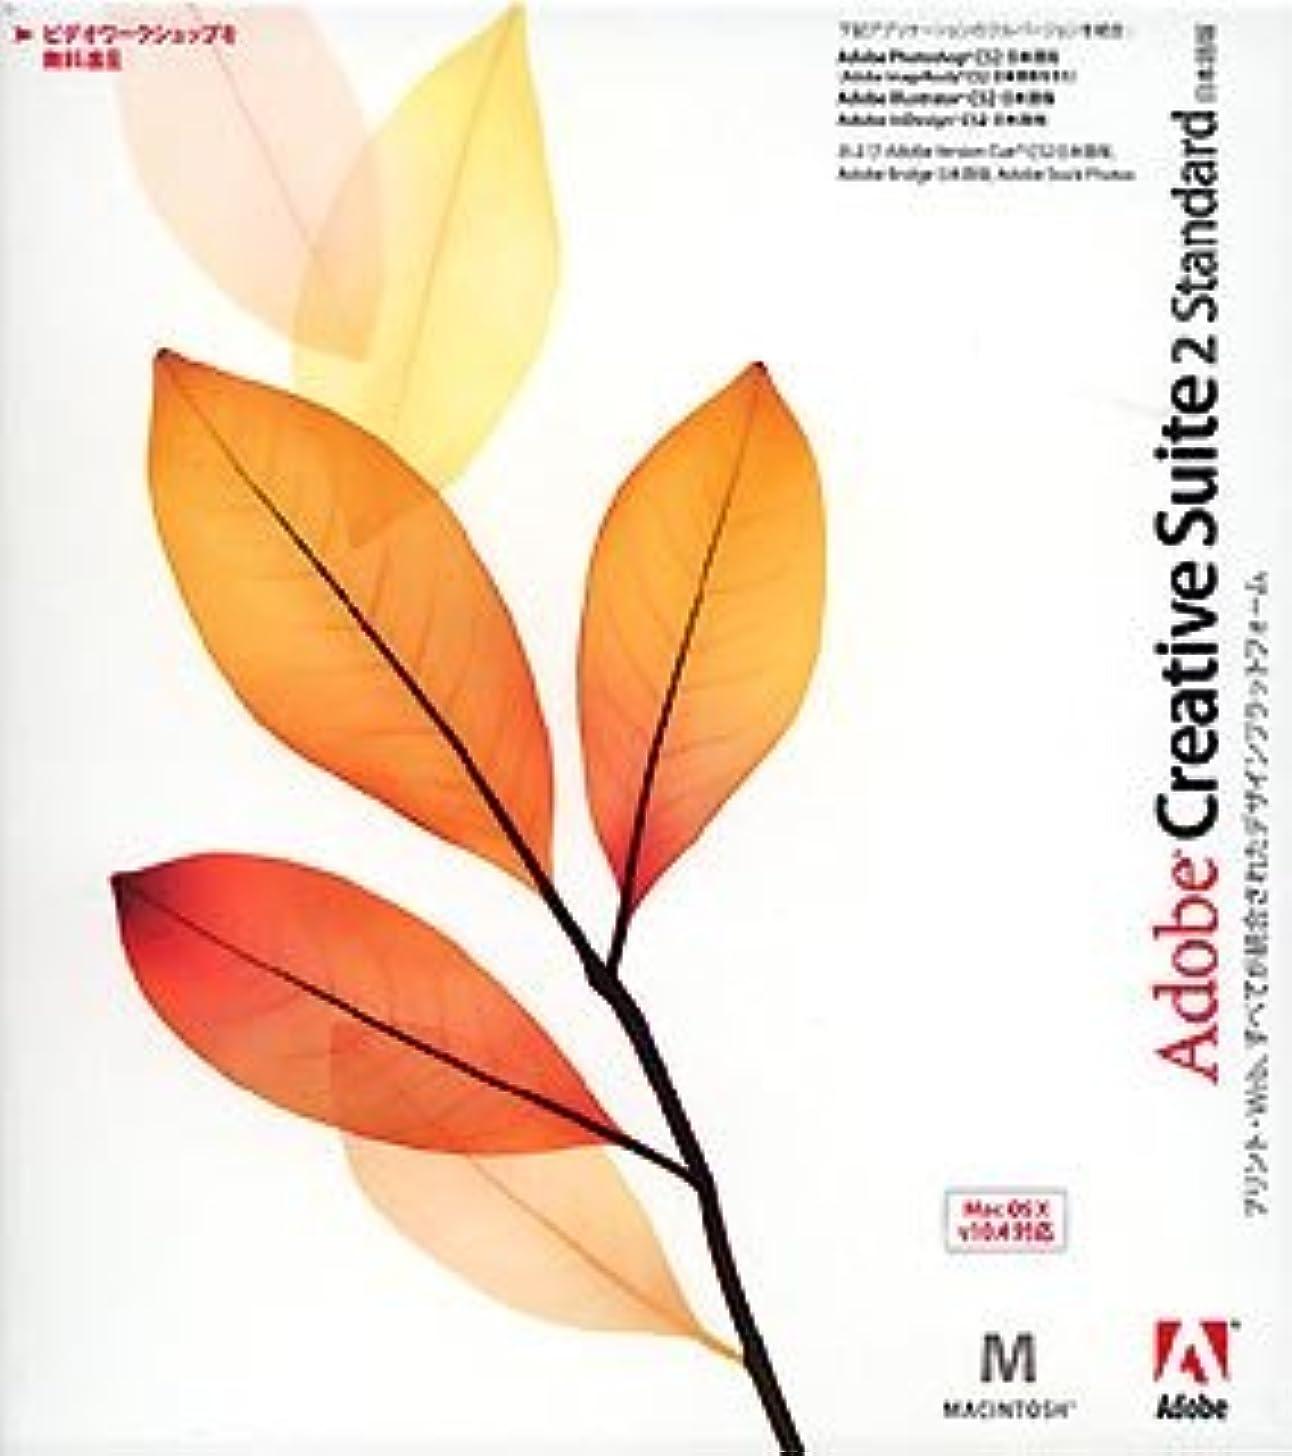 グレード和漏斗Adobe Creative Suite Standard 2.0 日本語版 Macintosh版 (旧製品)